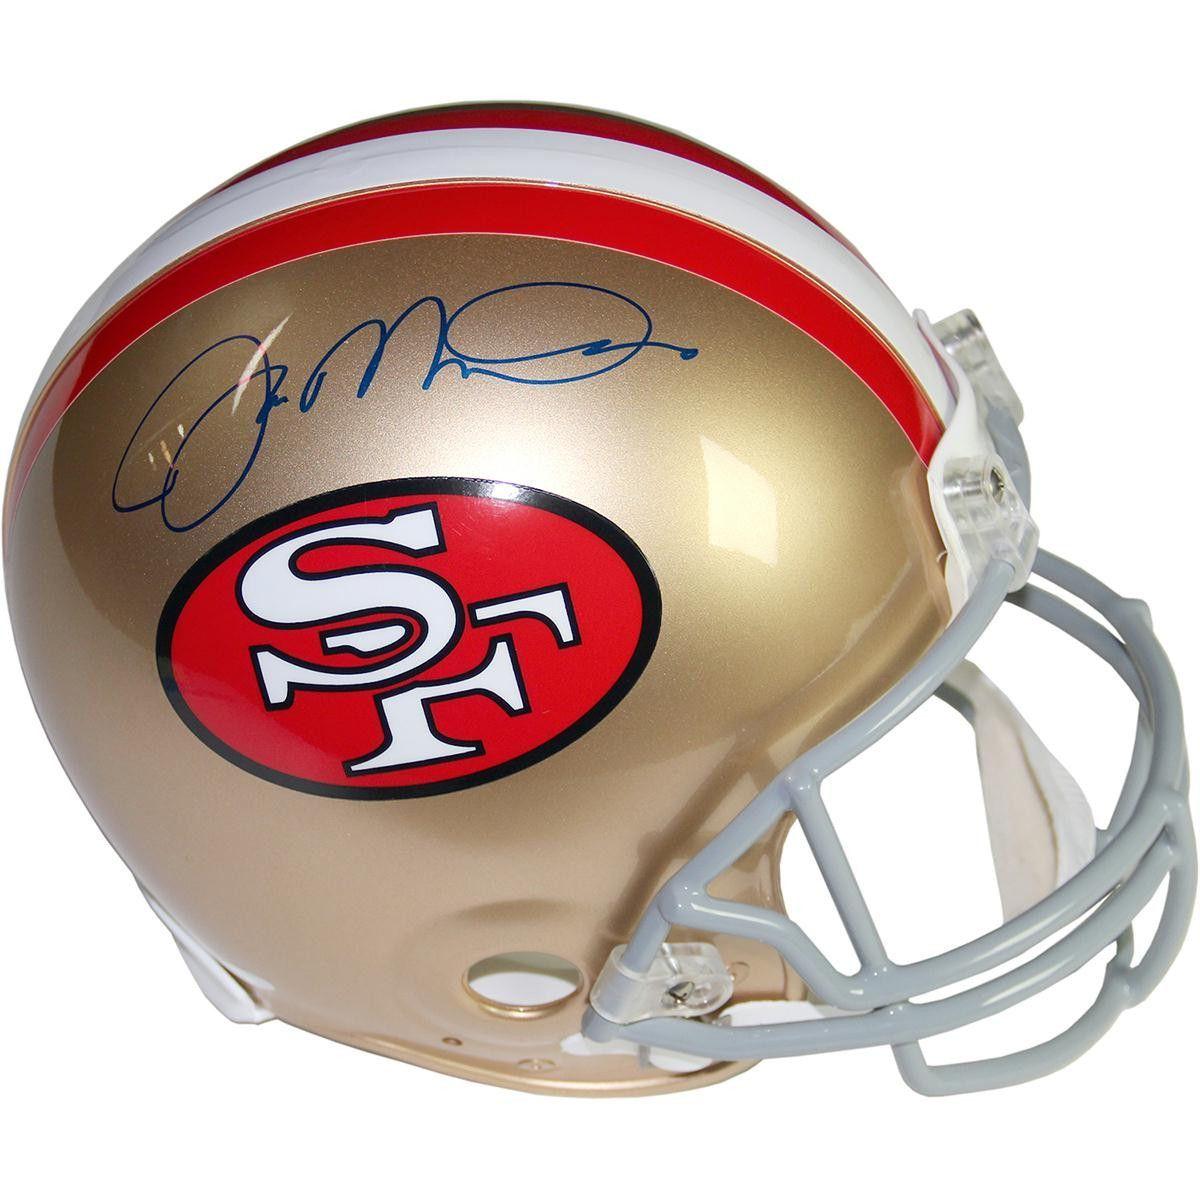 Joe Montana Signed San Francisco 49ers Authentic Helmet (Signed in Black)